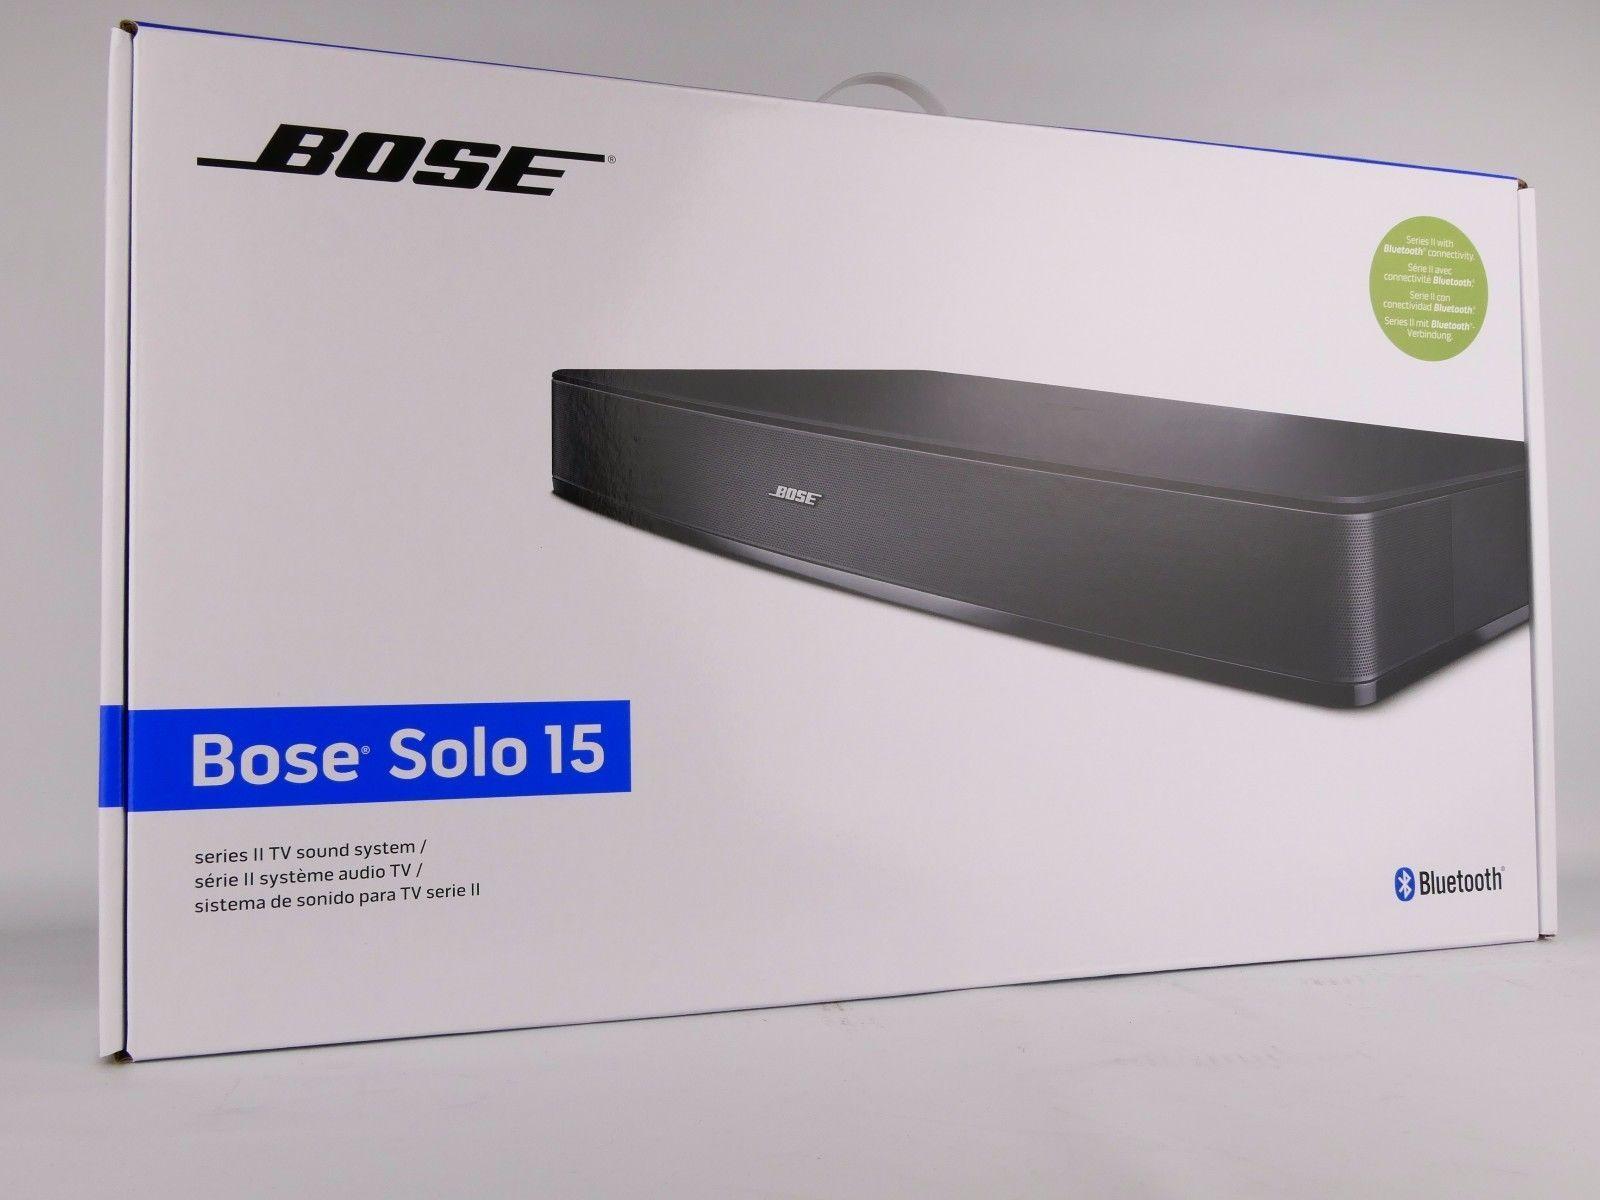 Bose Solo 15 Series Ii Tv Sound System Schwarz Neu Ovpsparen25com